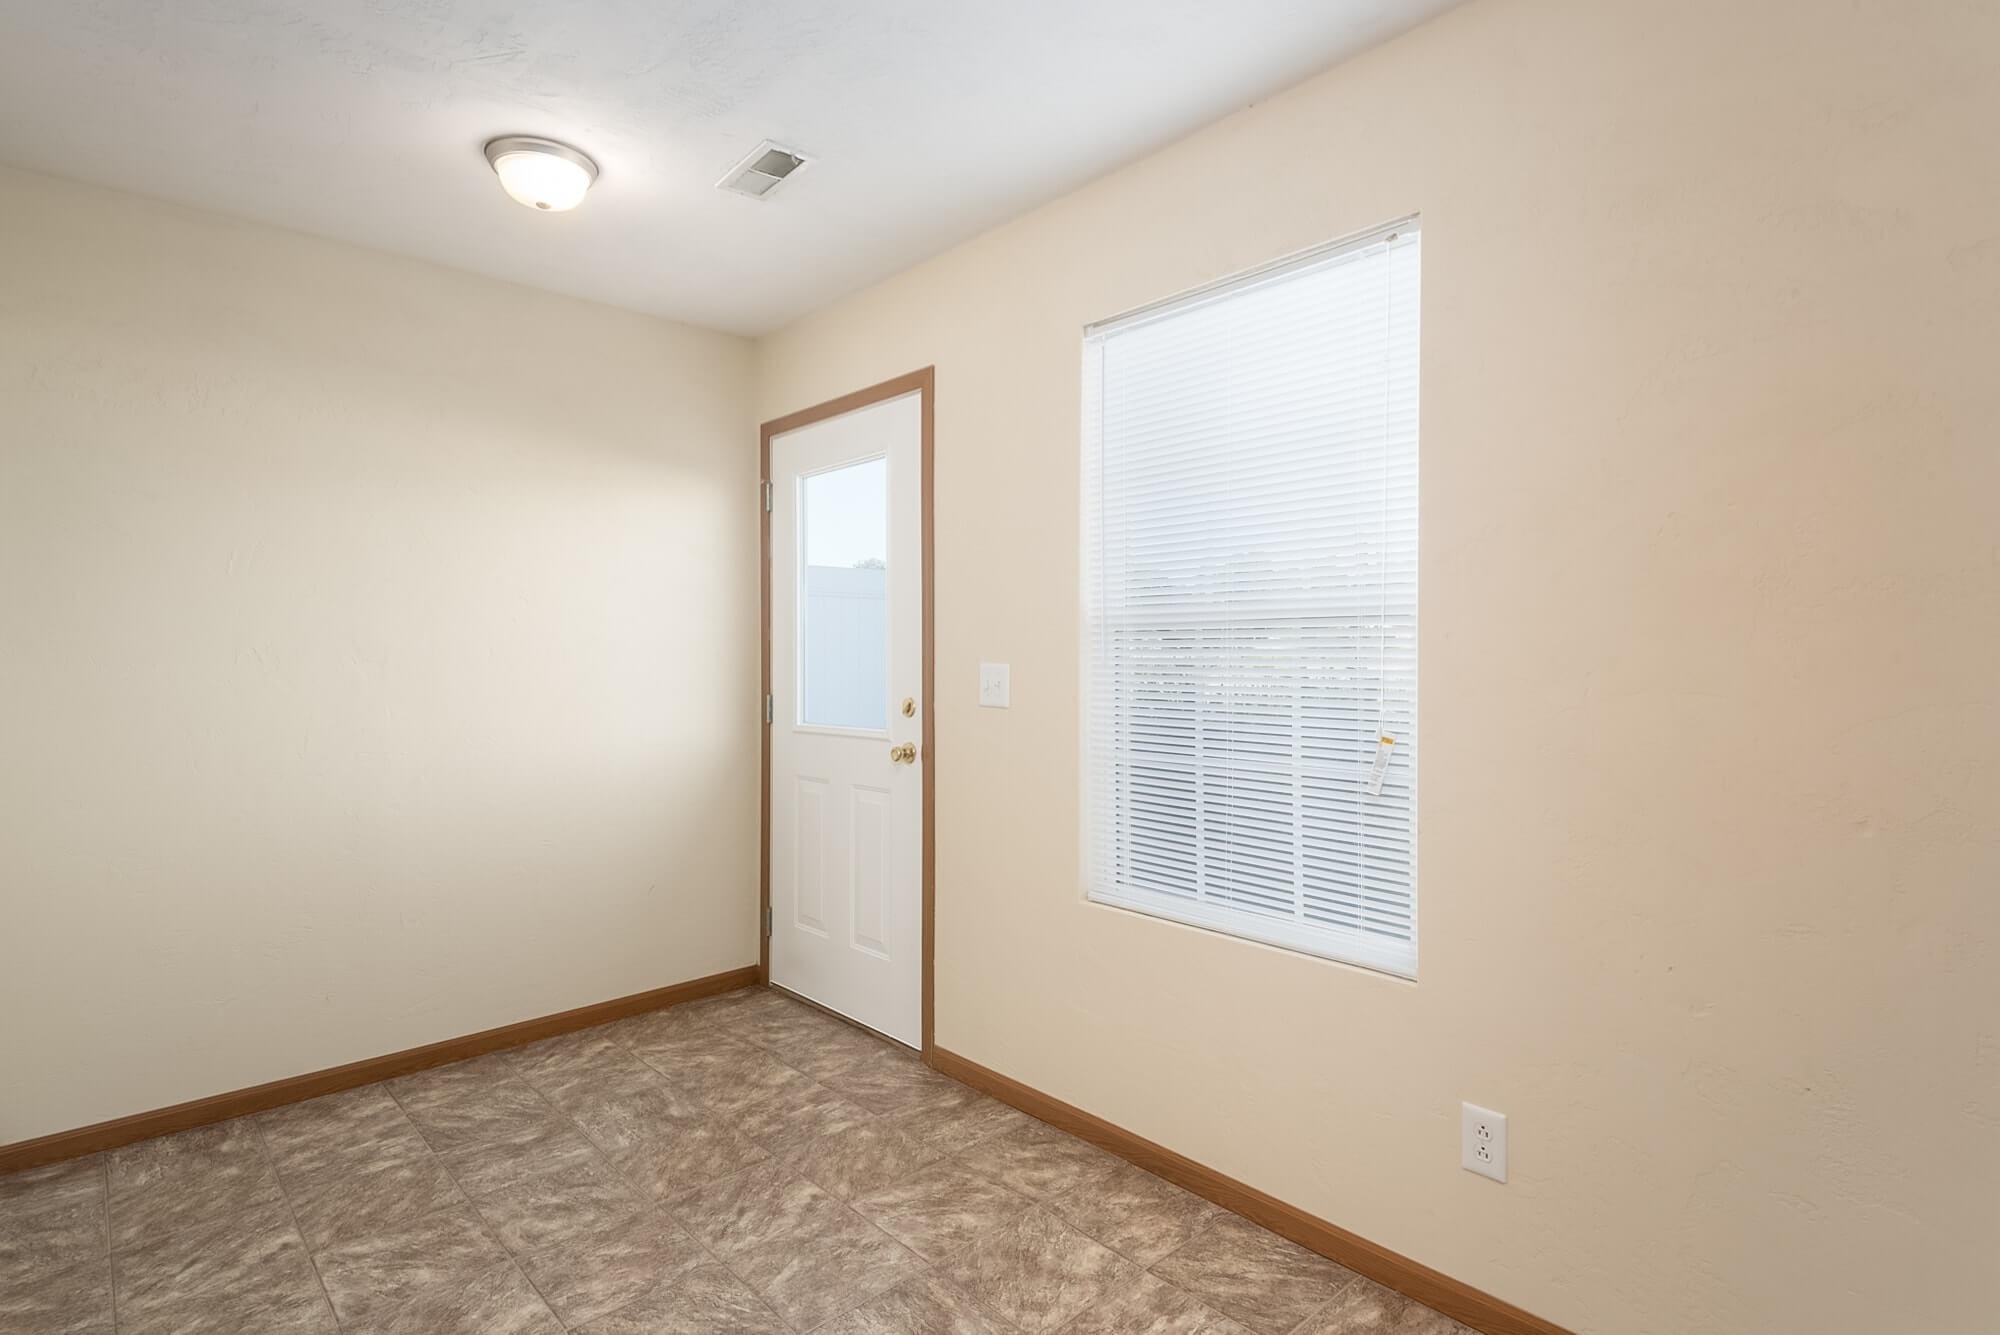 Two Bedroom House Lebanon, IL